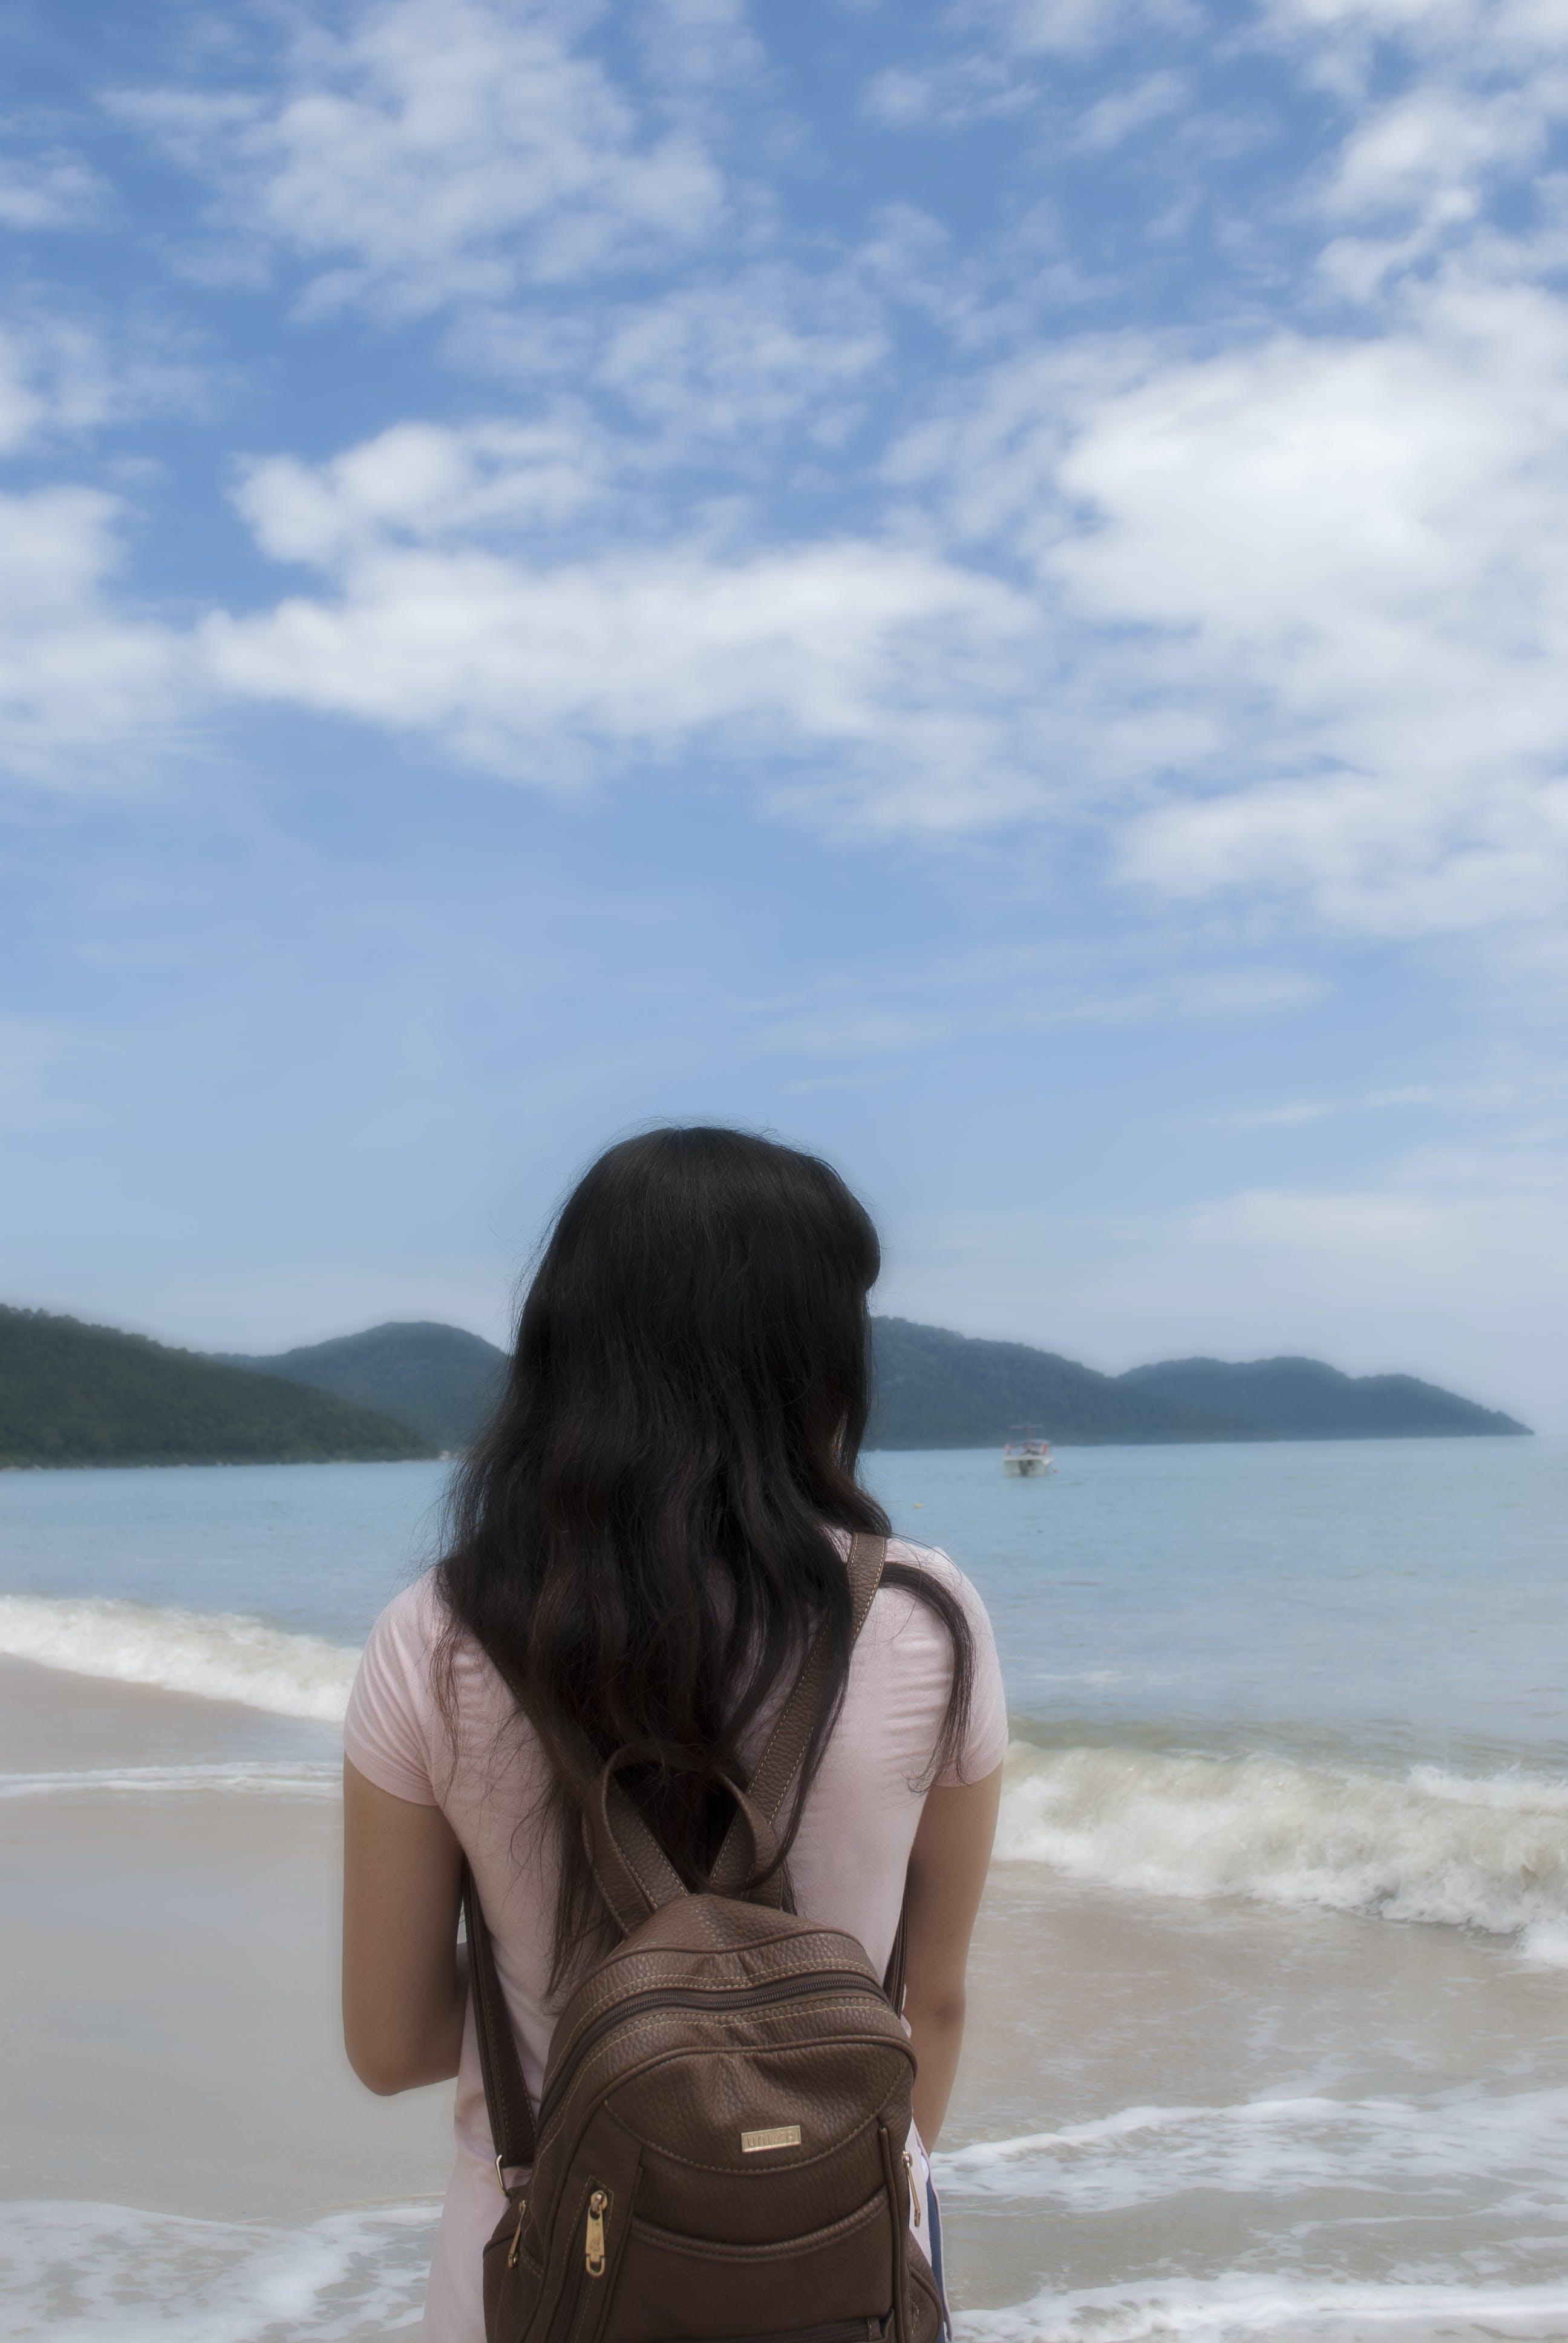 Free stock photo of asian girl, beach, blue, blue sky